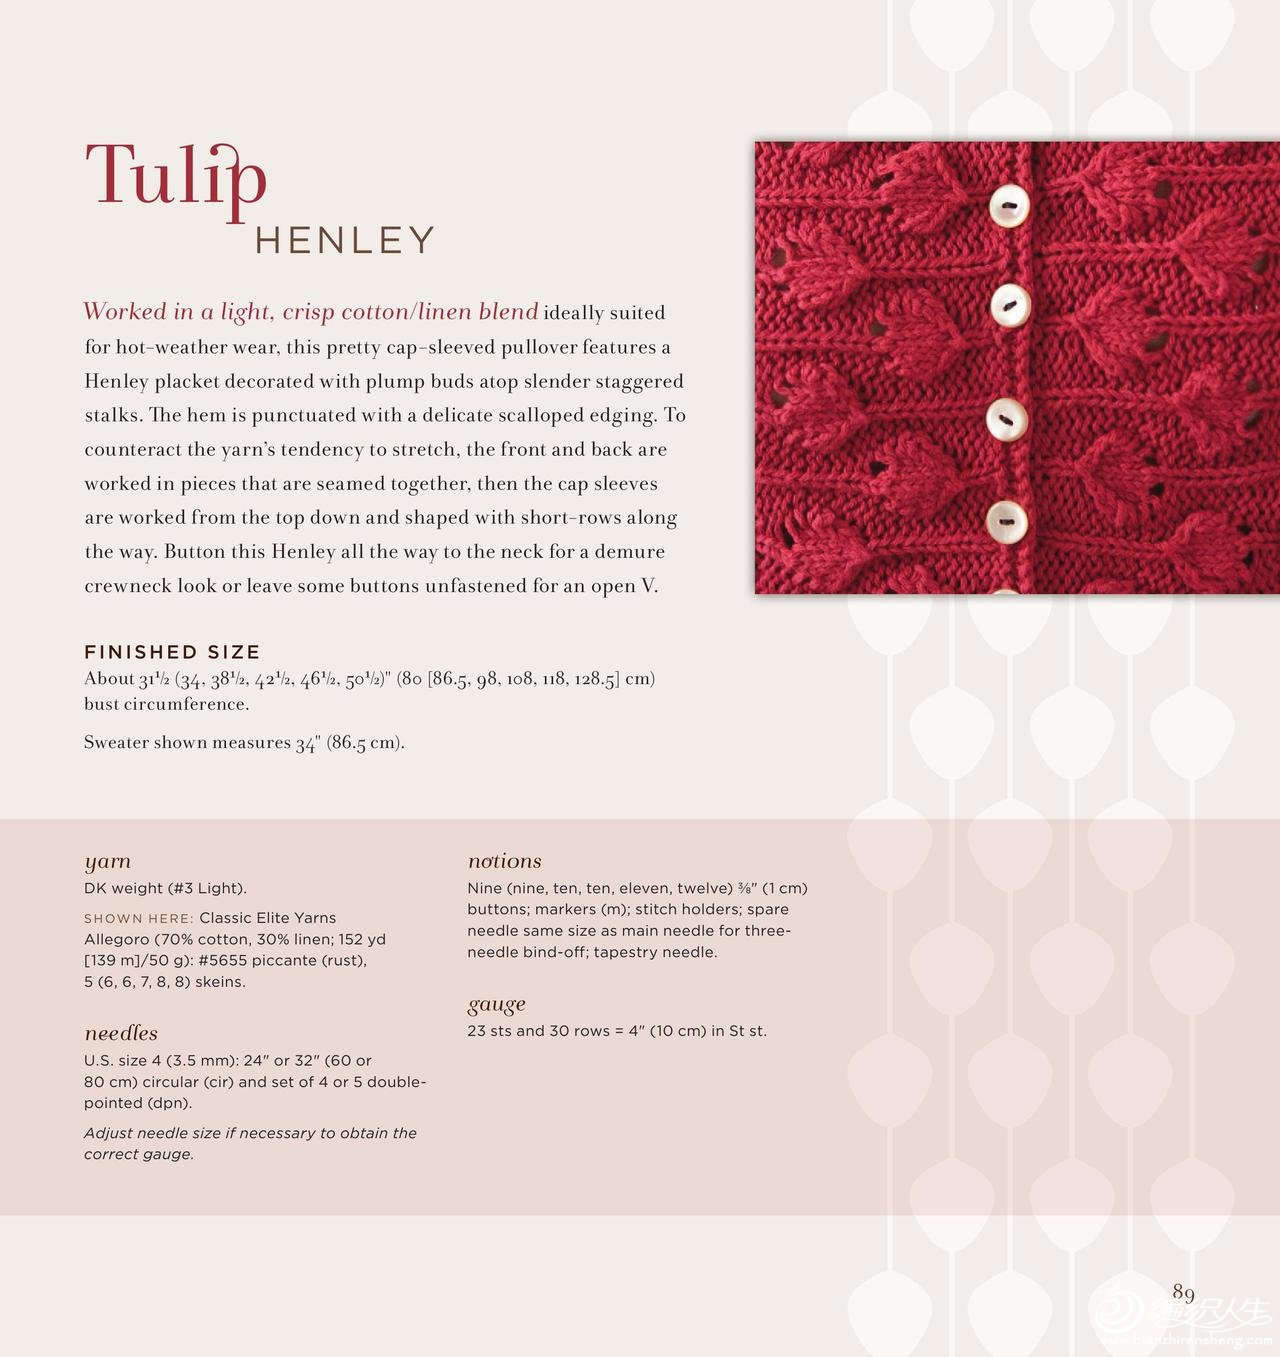 tulip henley-2.jpg